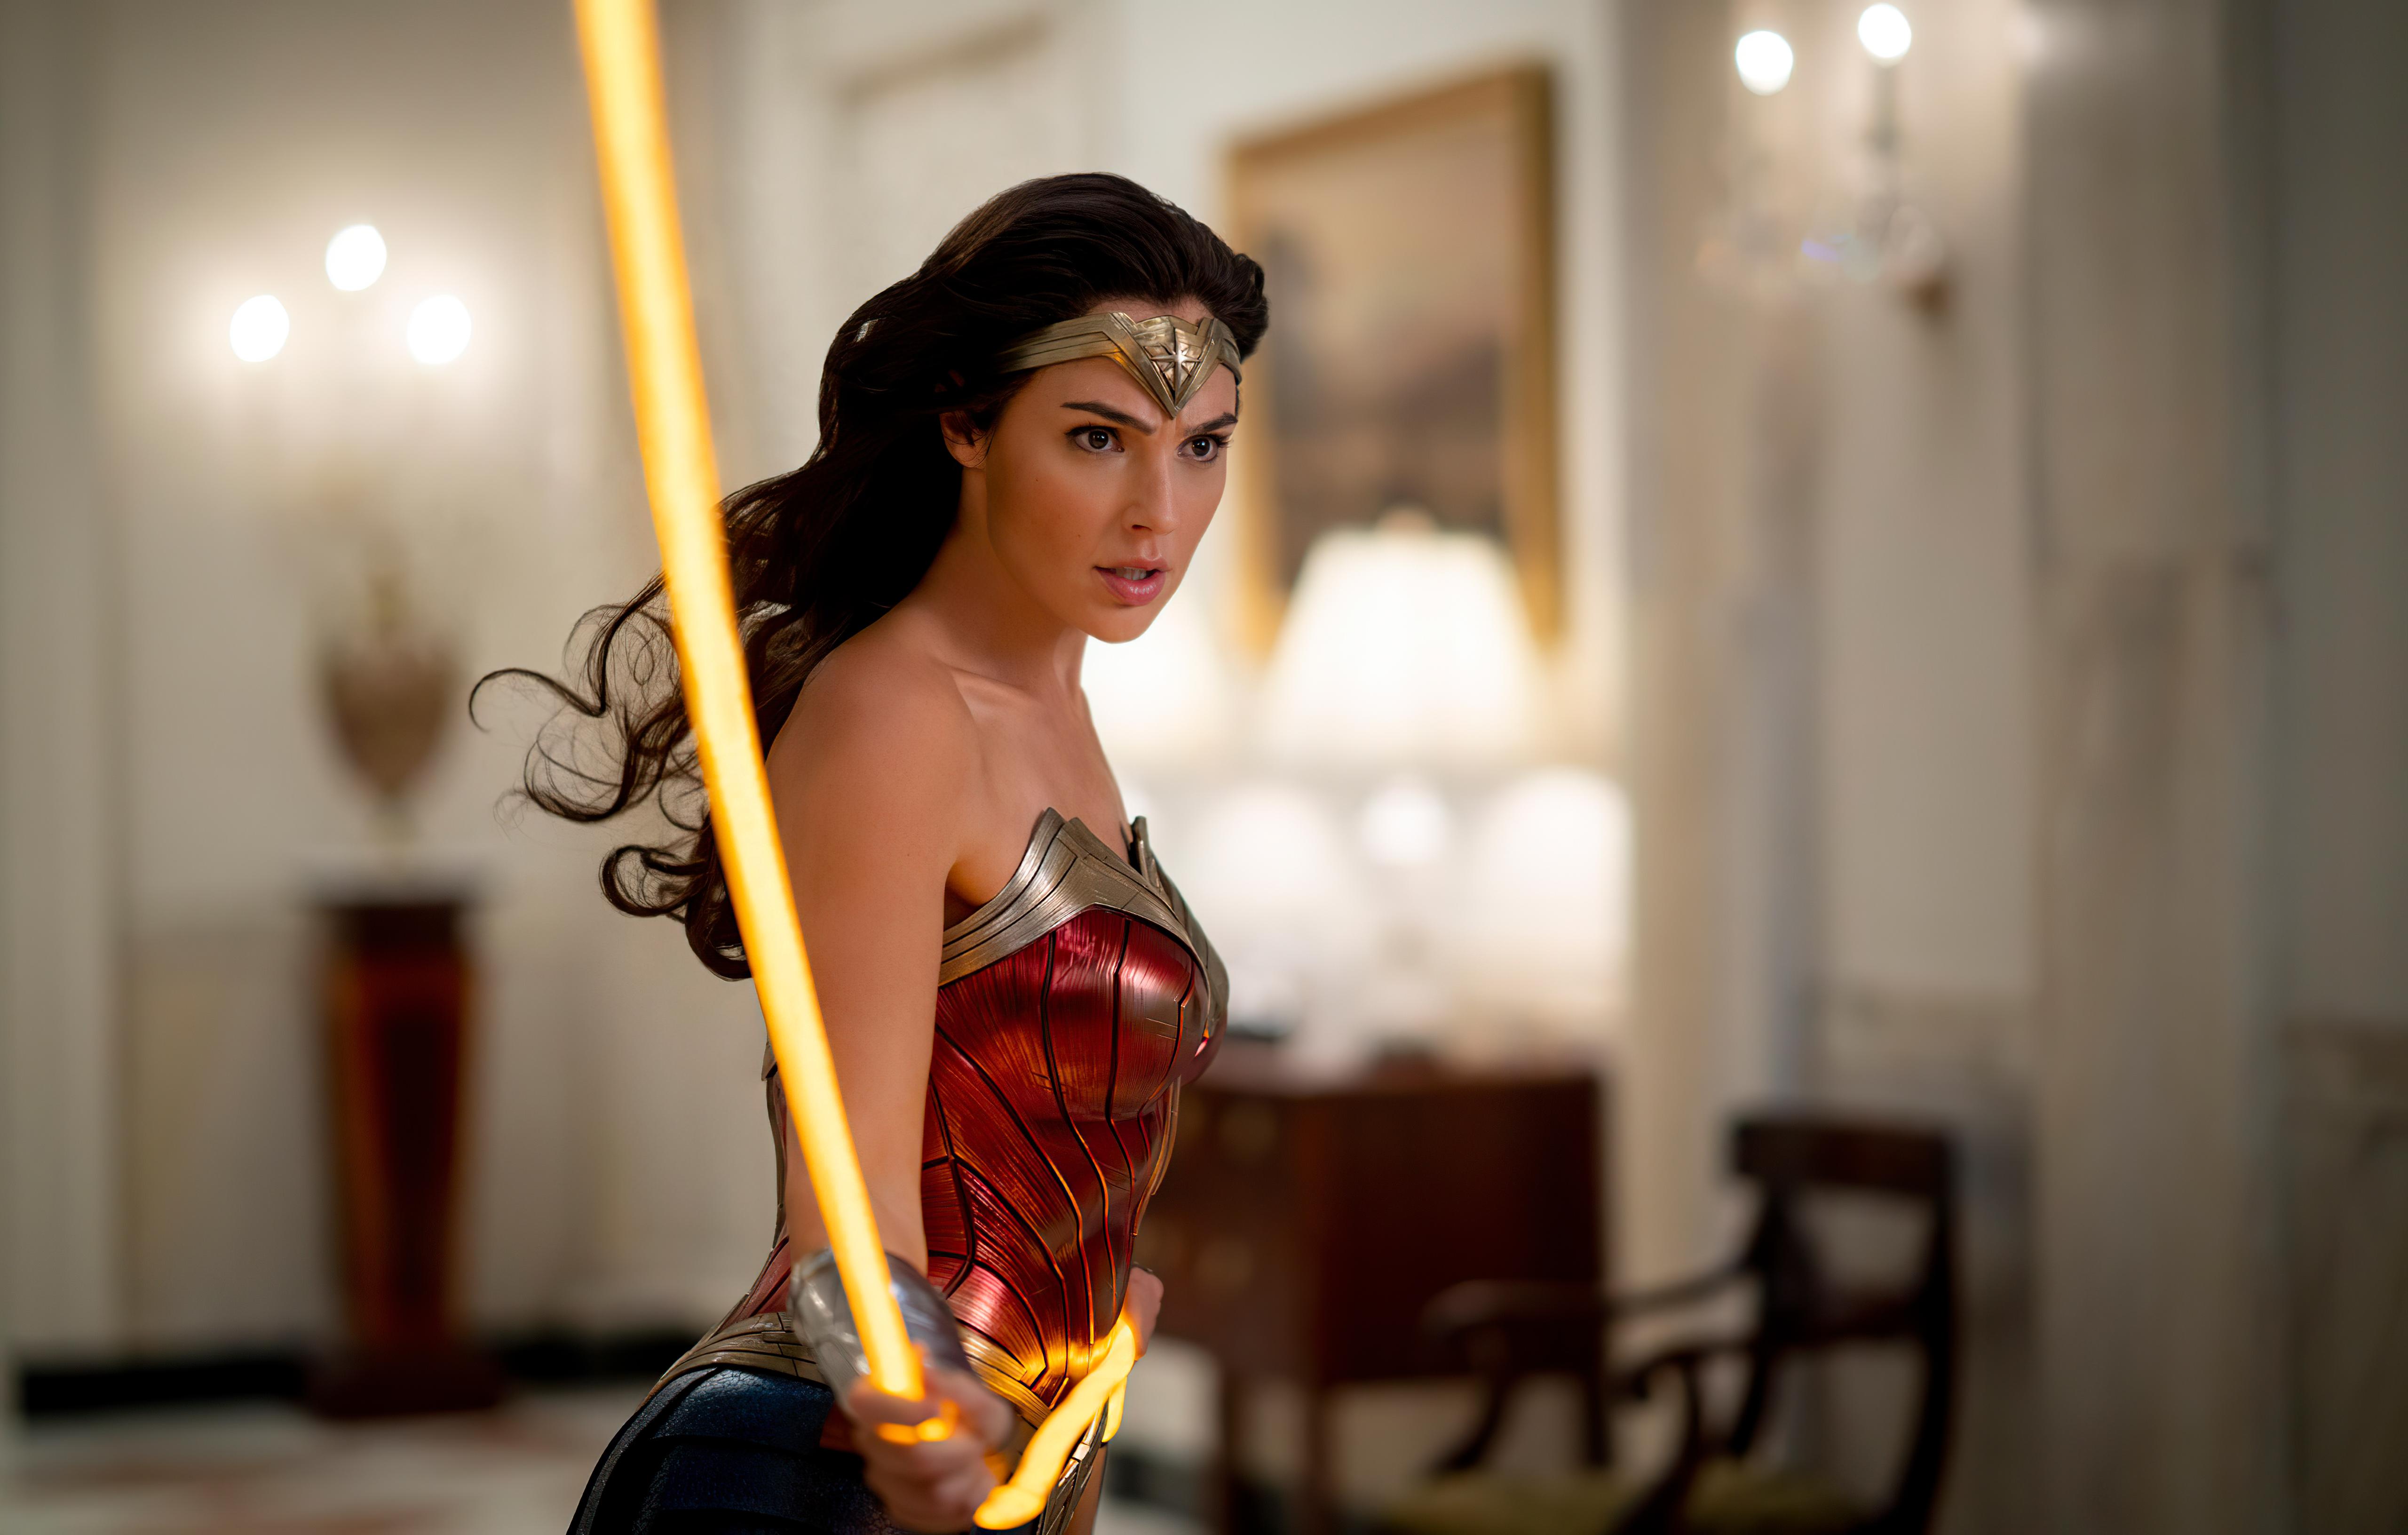 gal gadot in wonder woman 1984 still 4k 1611597608 - Gal Gadot In Wonder Woman 1984 Still 4k - Gal Gadot In Wonder Woman 1984 Still 4k wallpaper